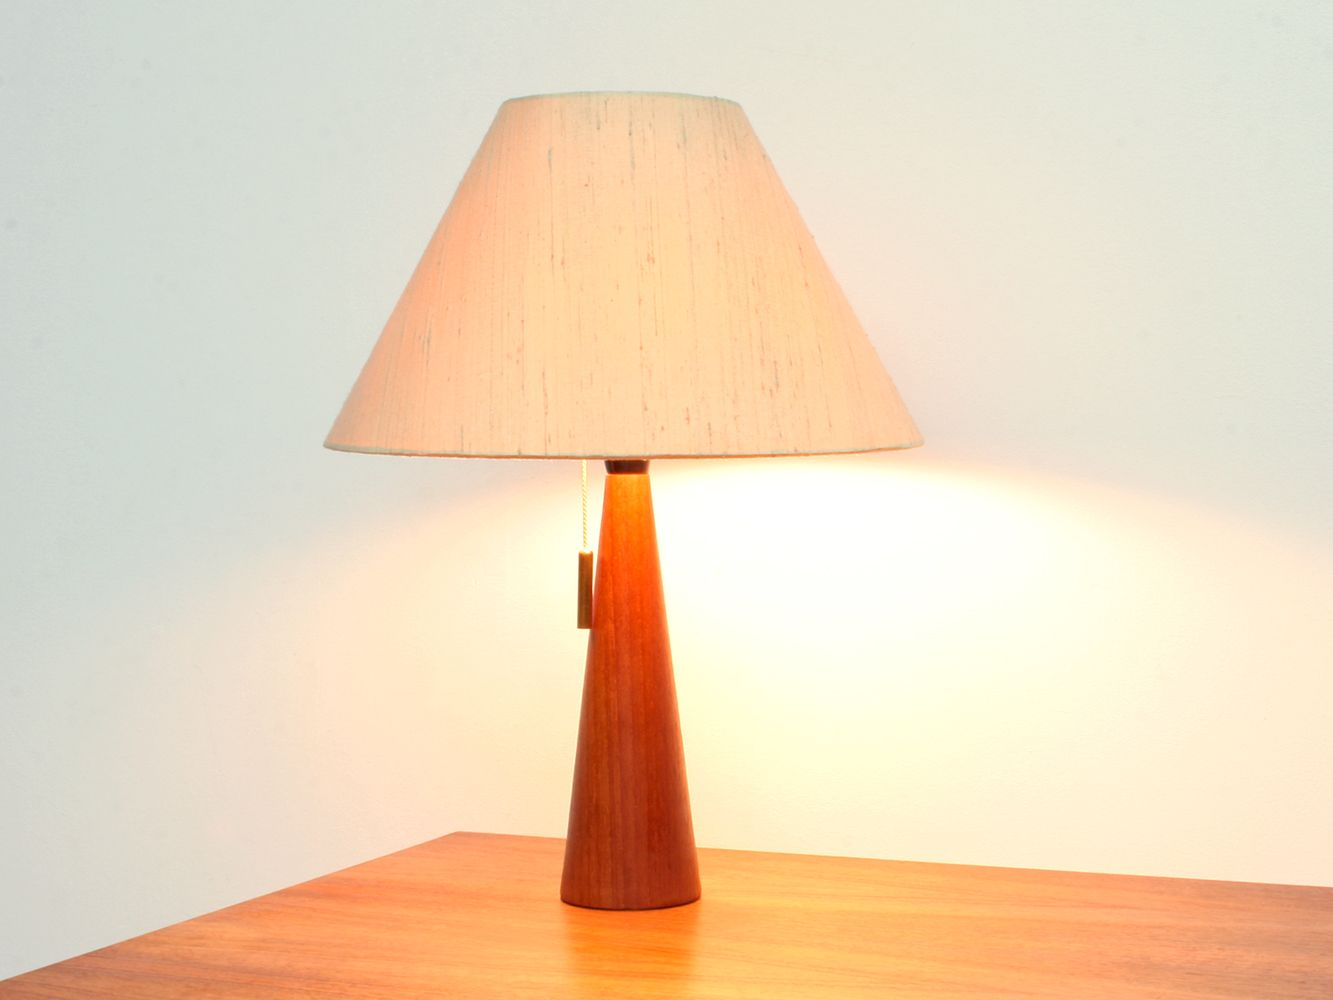 Mid-Century Danish Teak Desk Lamp, 1950s for sale at Pamono